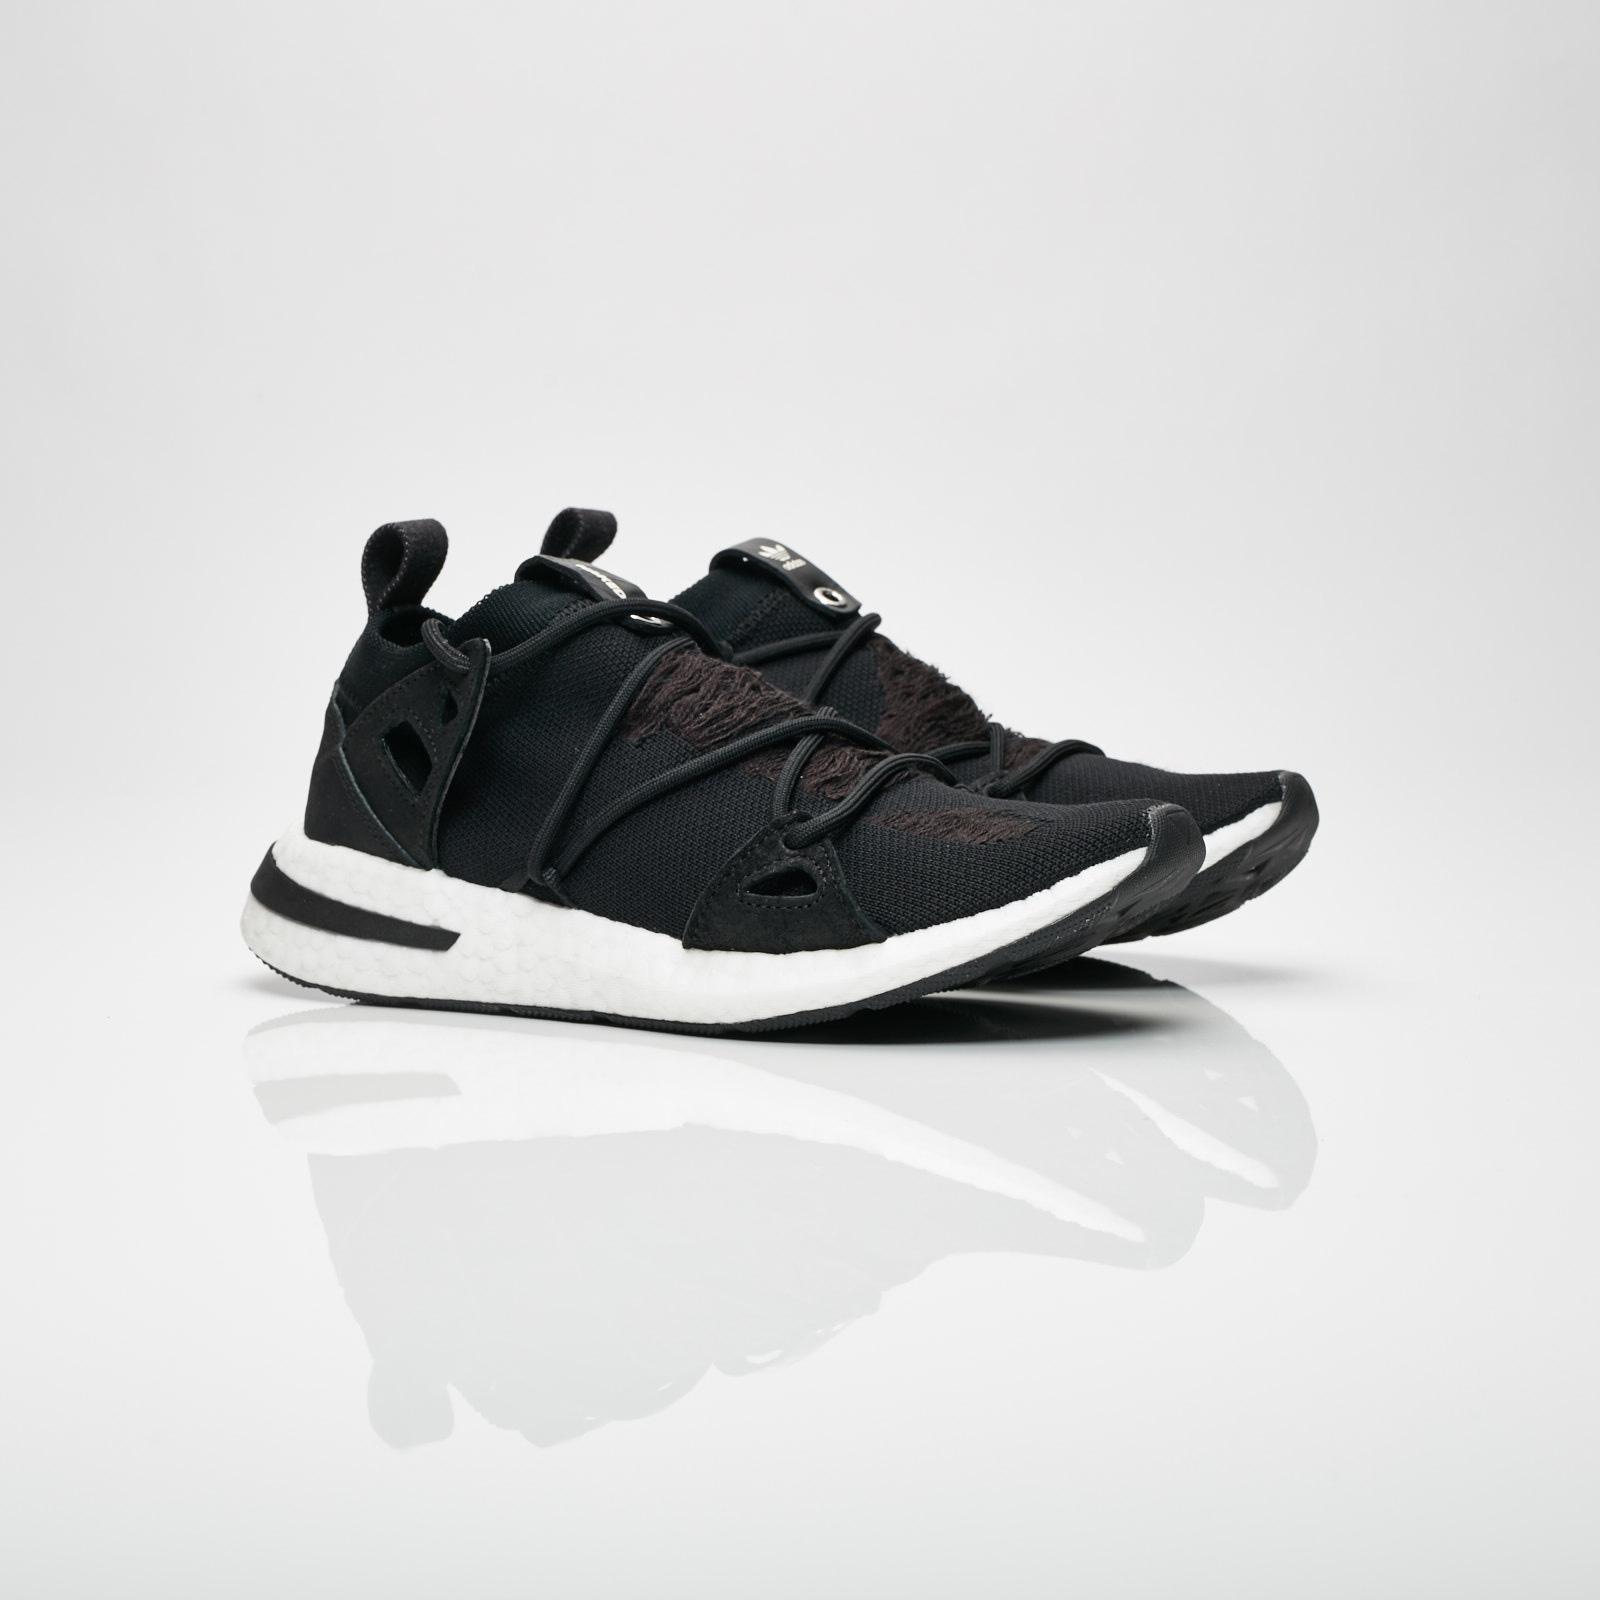 adidas Arkyn W x Naked - Ac7669 - Sneakersnstuff  5165a32c7